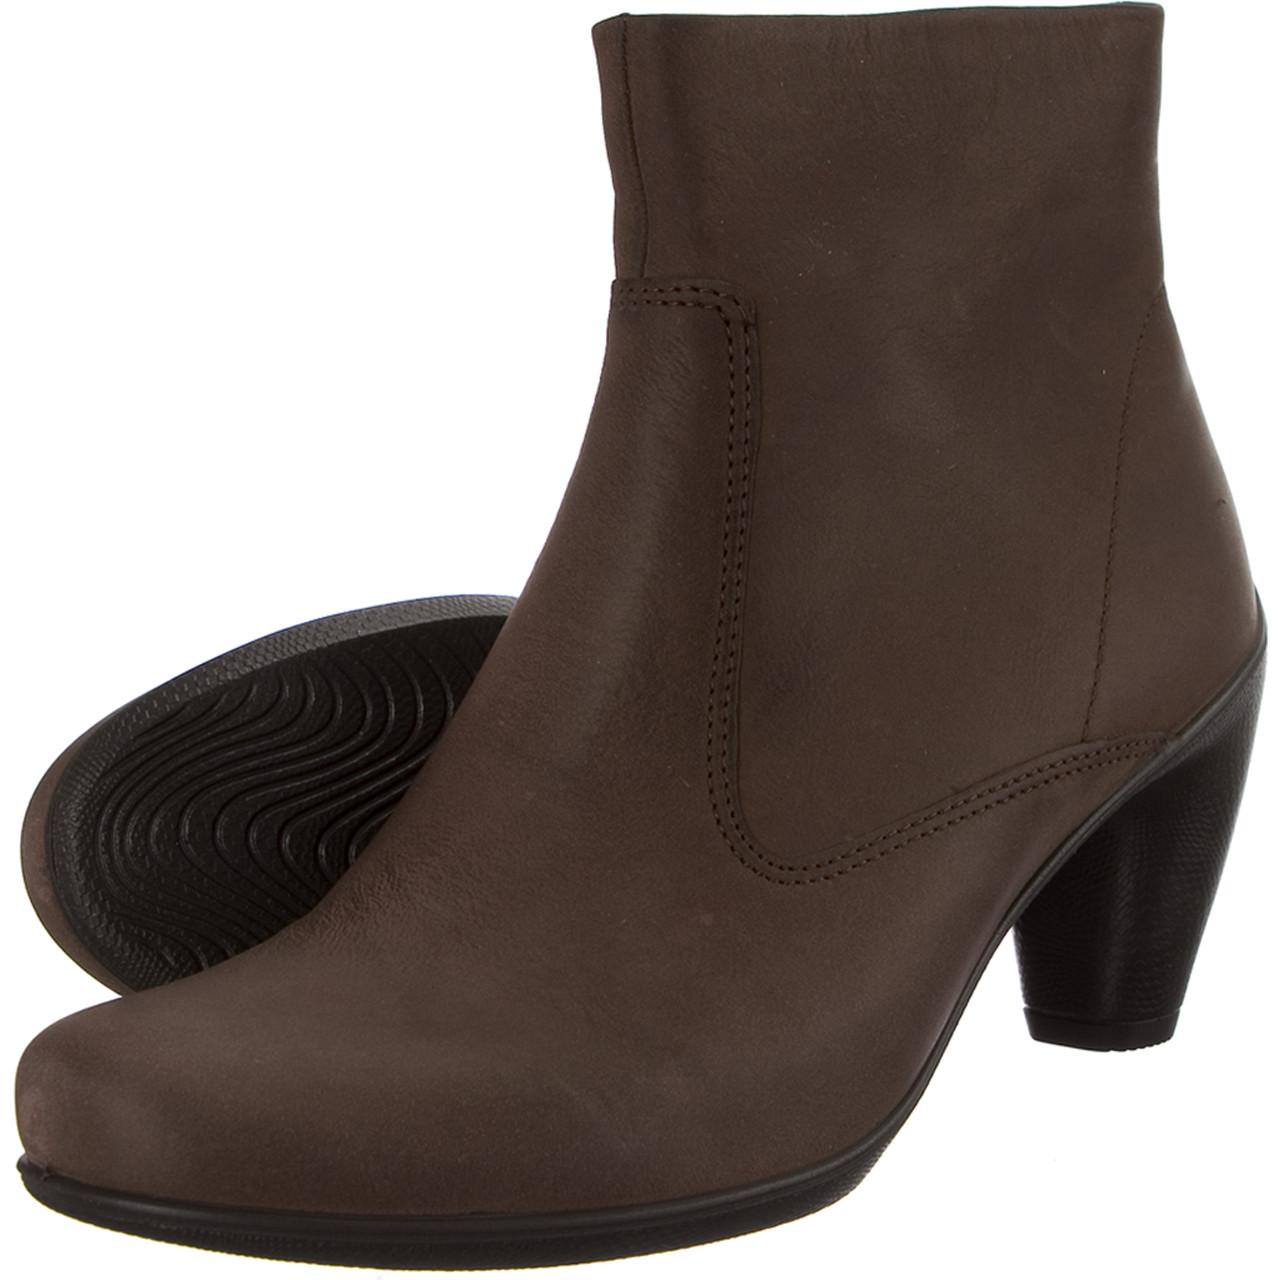 buty ecco damskie botki